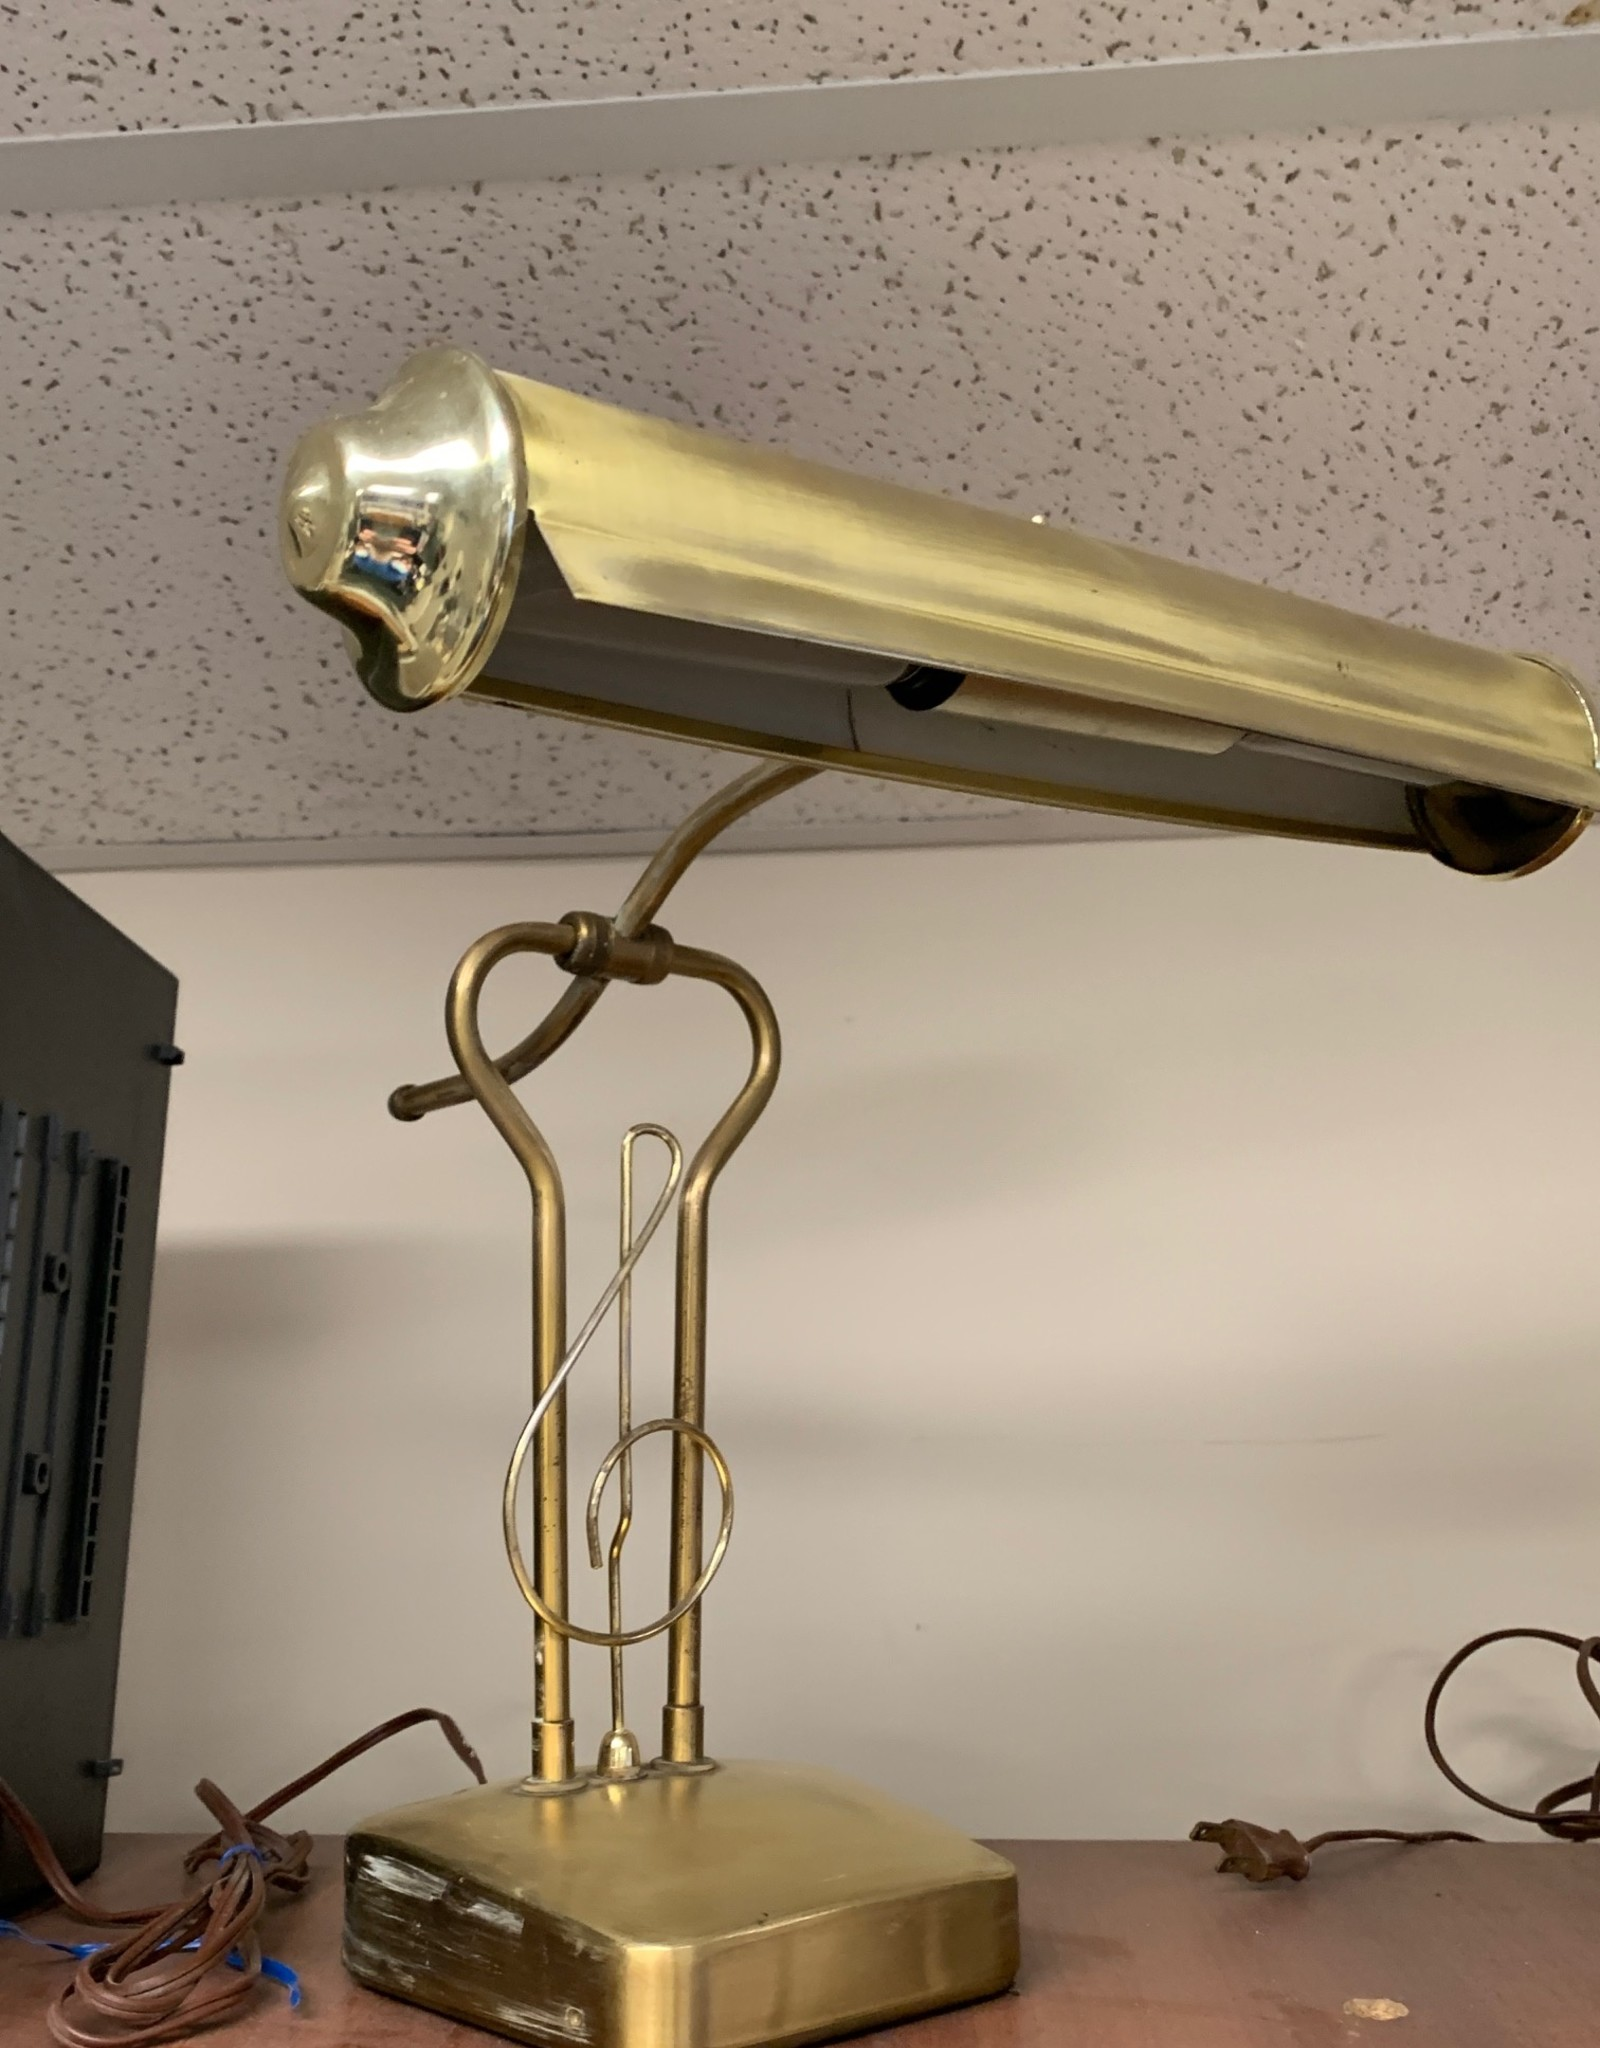 Pre-Owned Piano Lamp (treble clef)